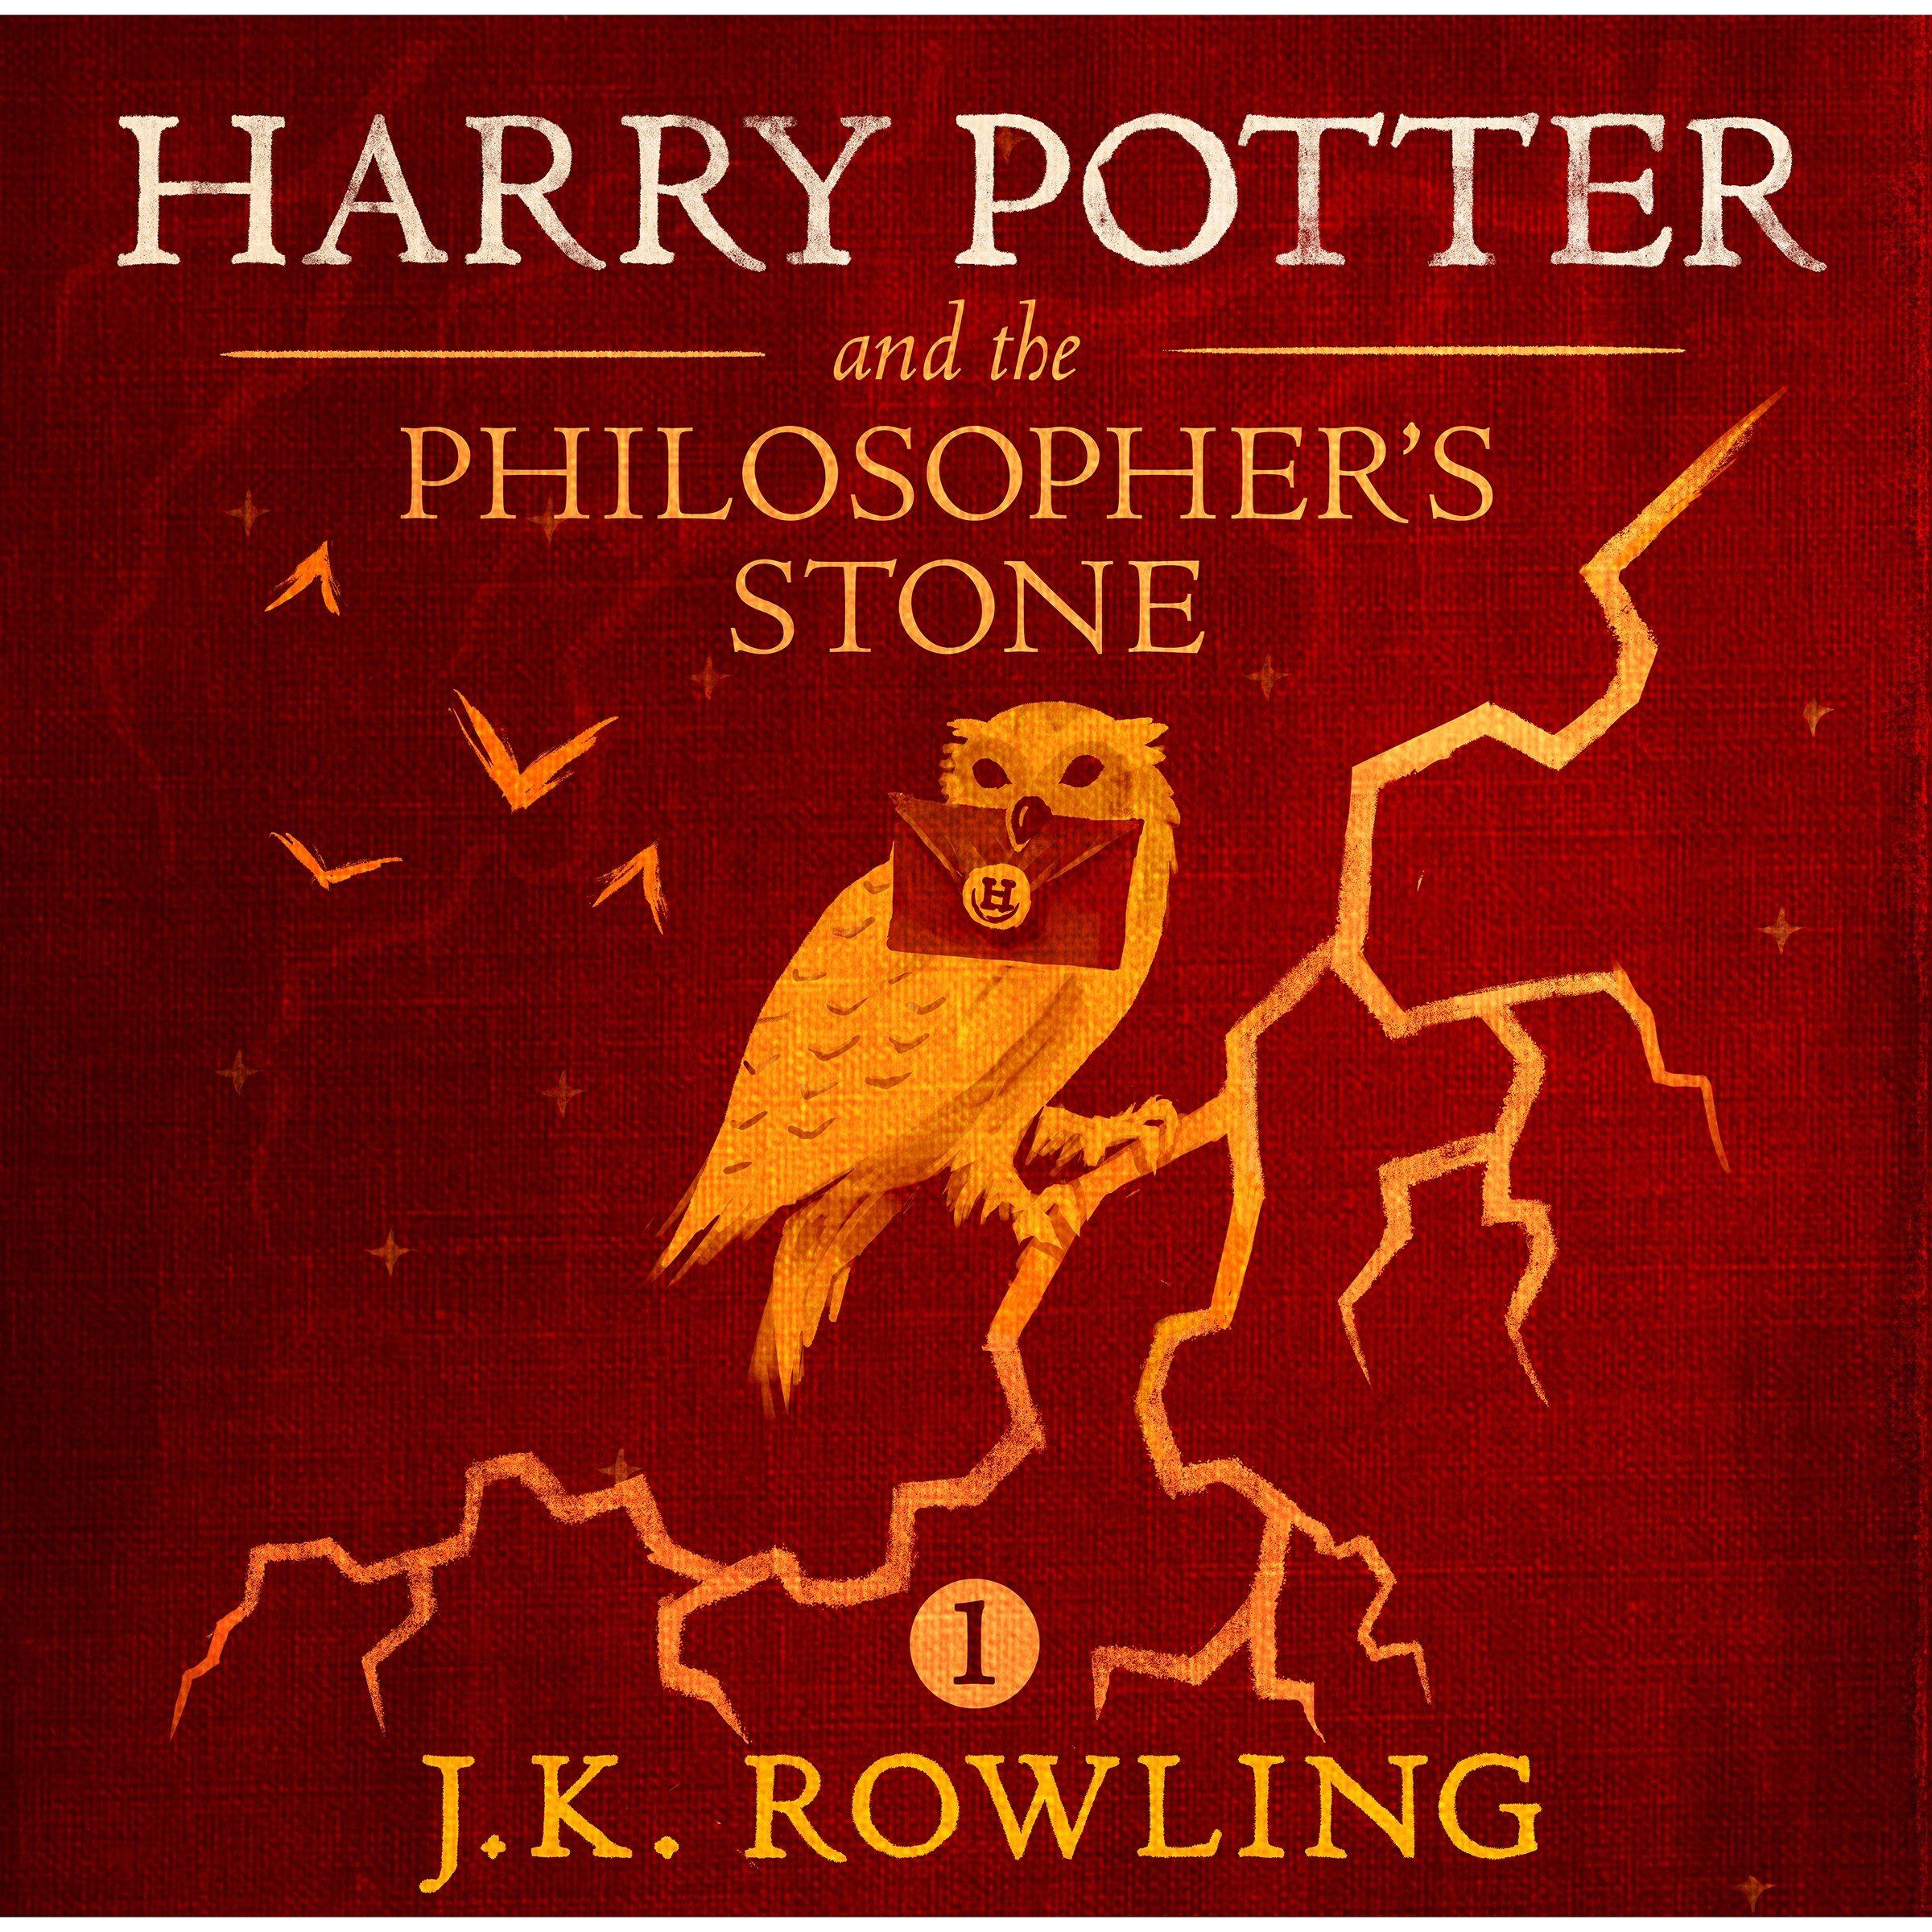 Audible UK Harry Potter - J.K. Rowling Link Thumbnail | Linktree